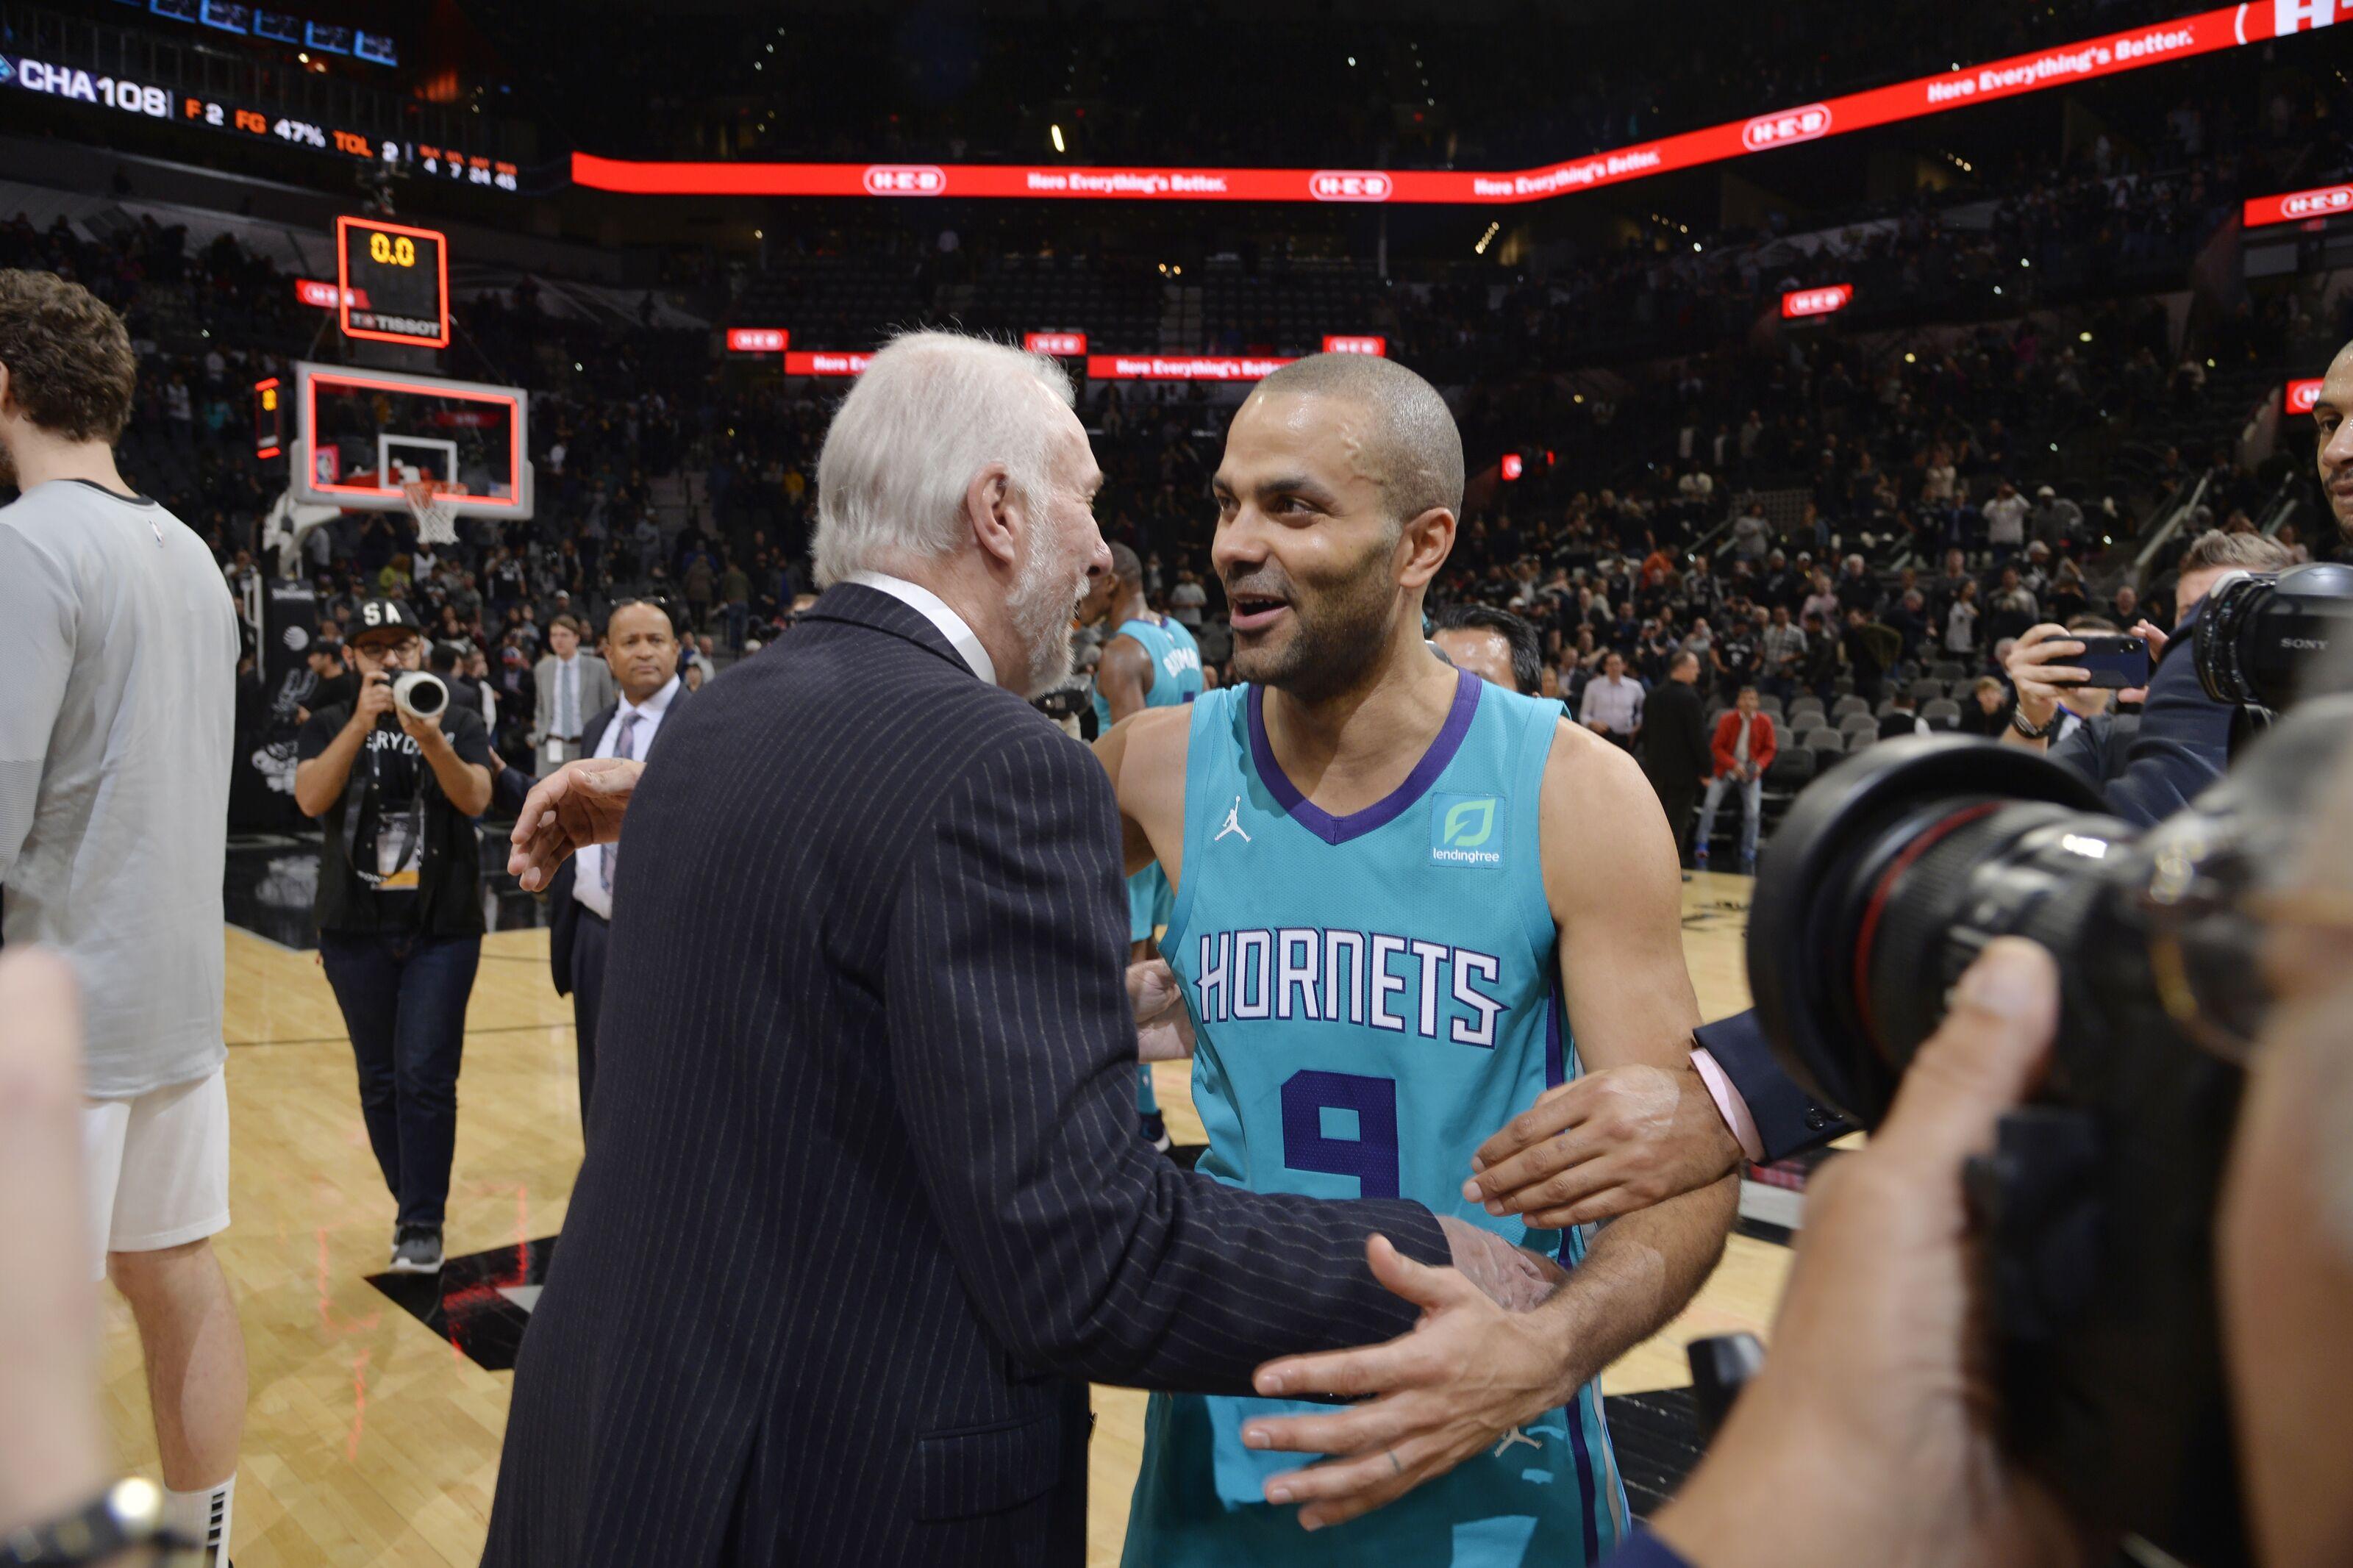 Charlotte Hornets Alumni: Spurs to retire Tony Parker's number next season